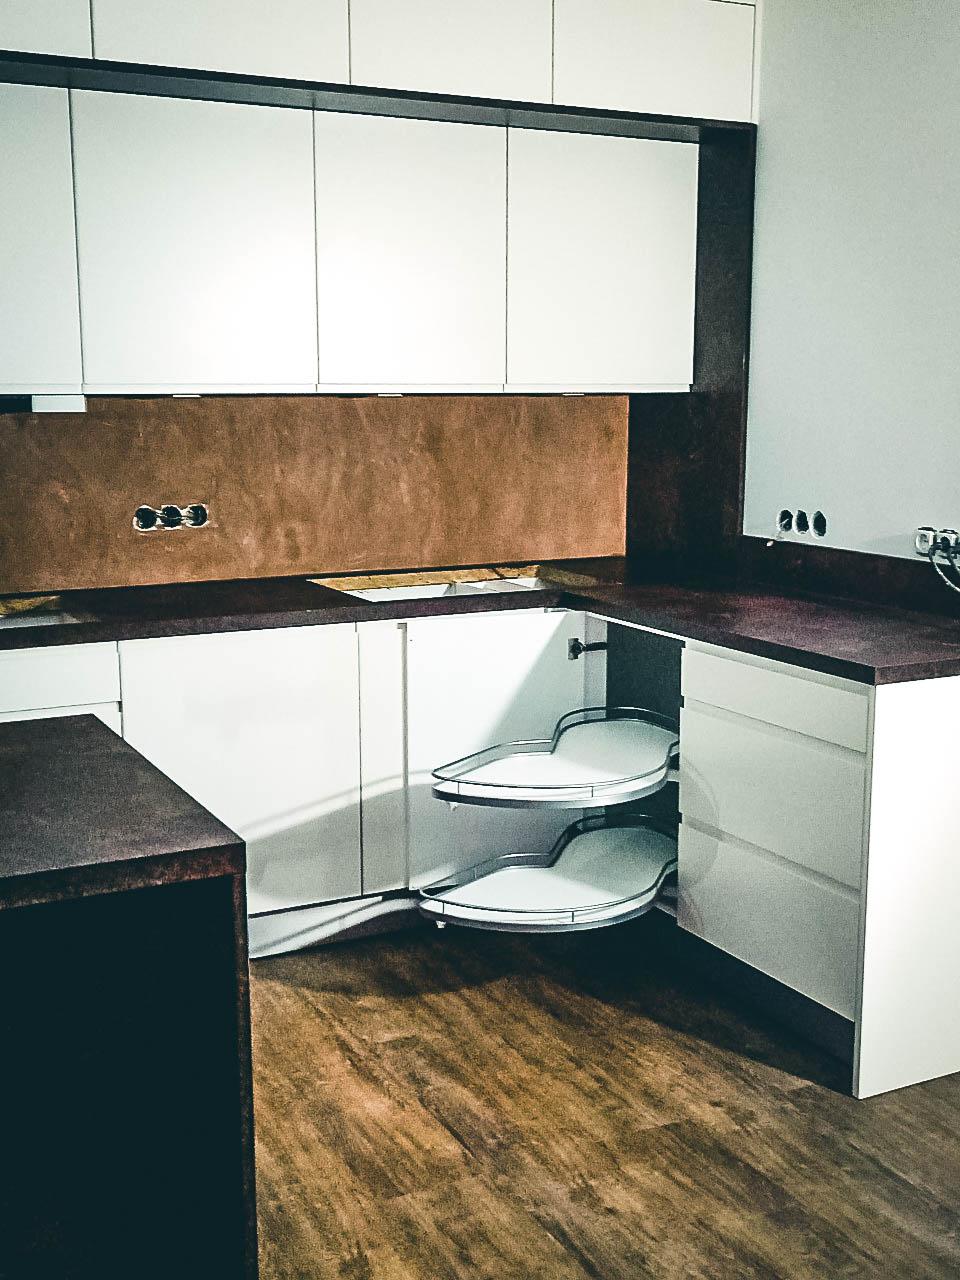 3d k che in hamburg eppendorf interiors design. Black Bedroom Furniture Sets. Home Design Ideas